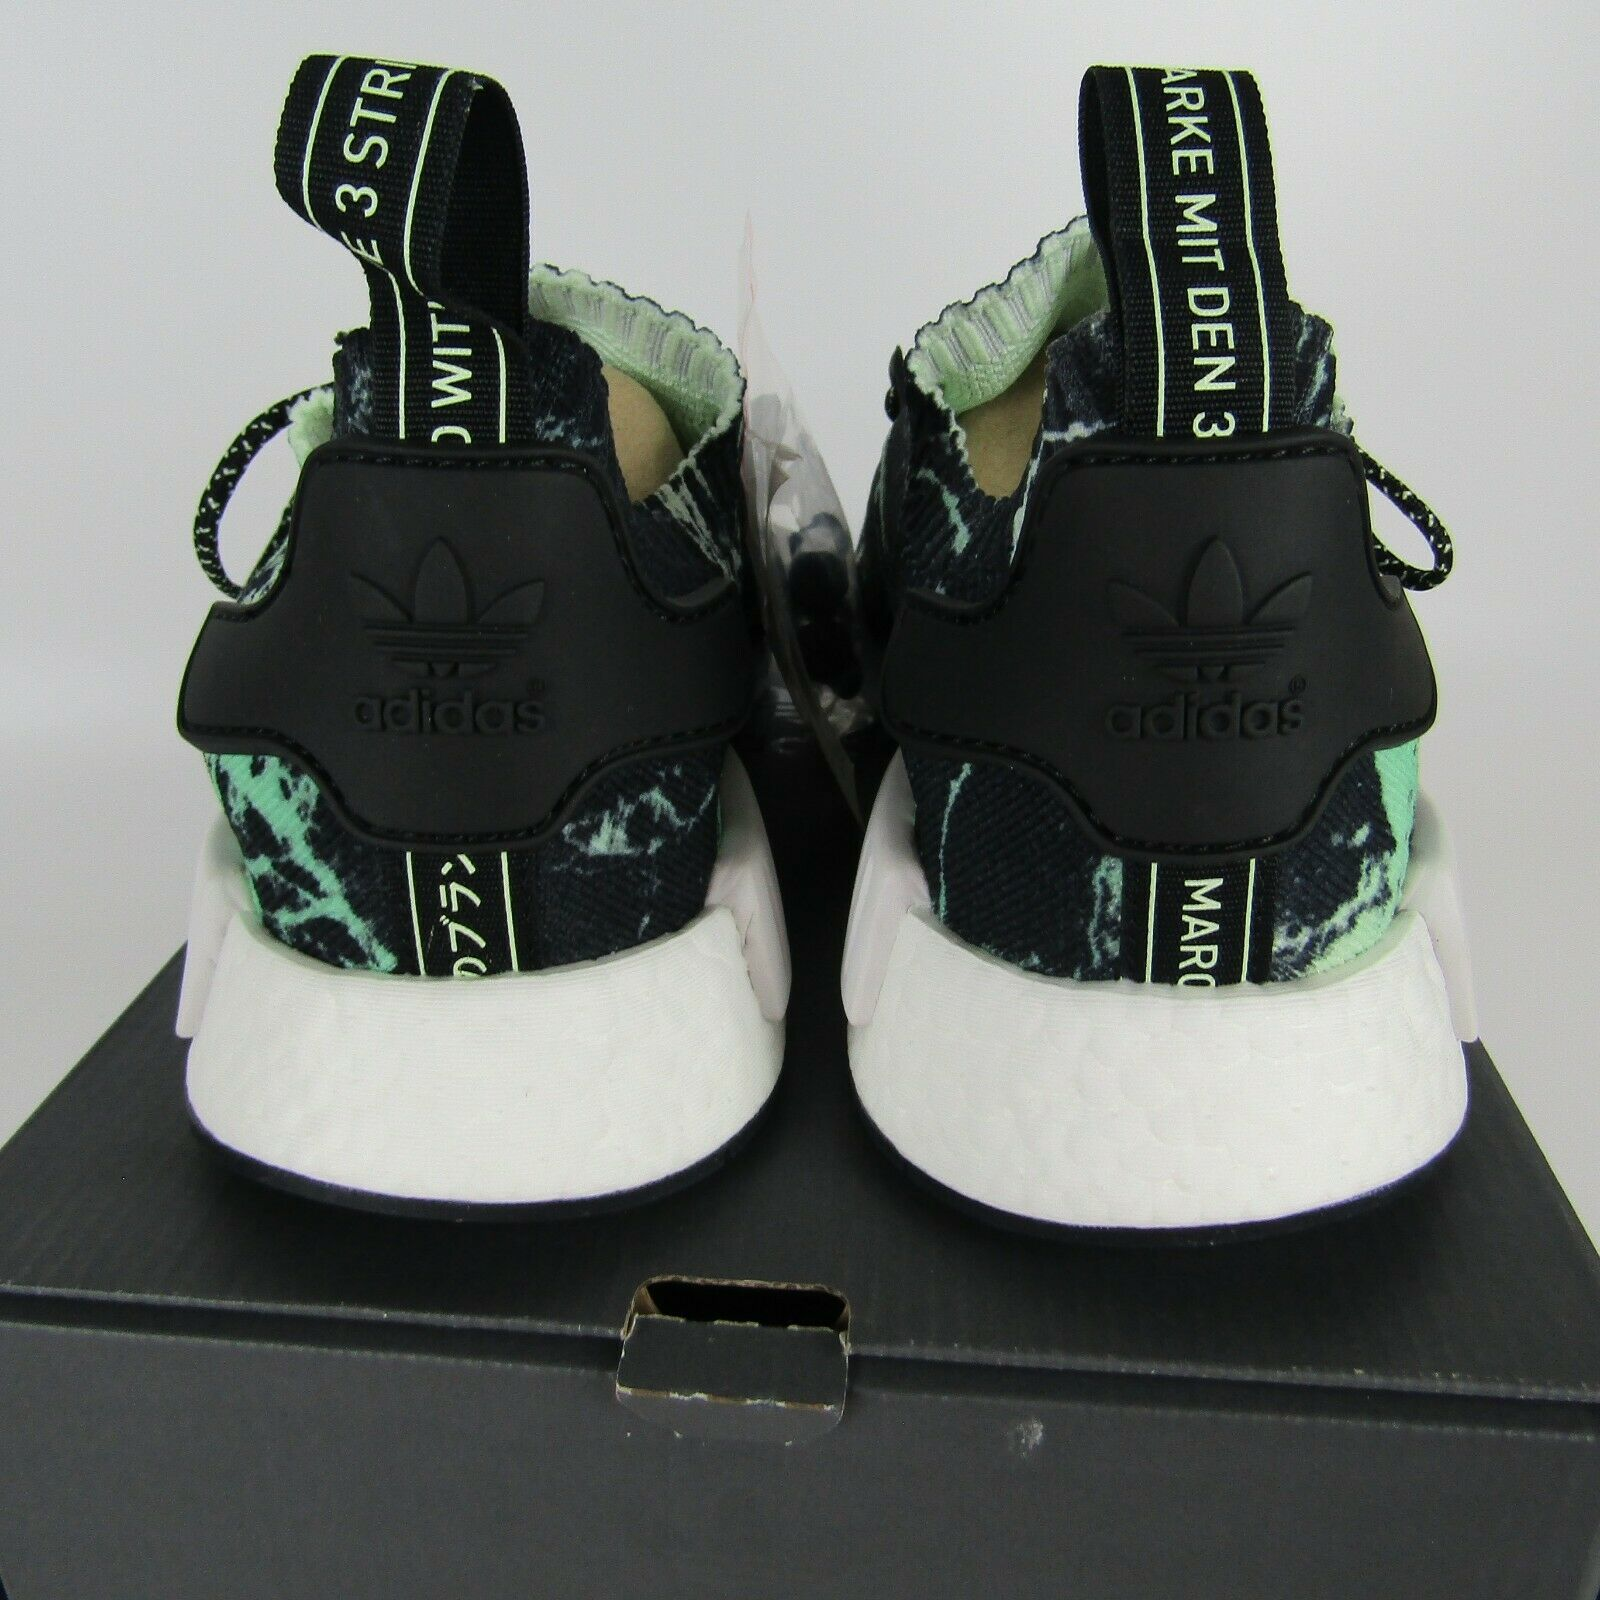 "Adidas Nmd_R1 Primeknit "" Grün Marmor "" Schuhe Herren Größe 12 BB7996 image 5"